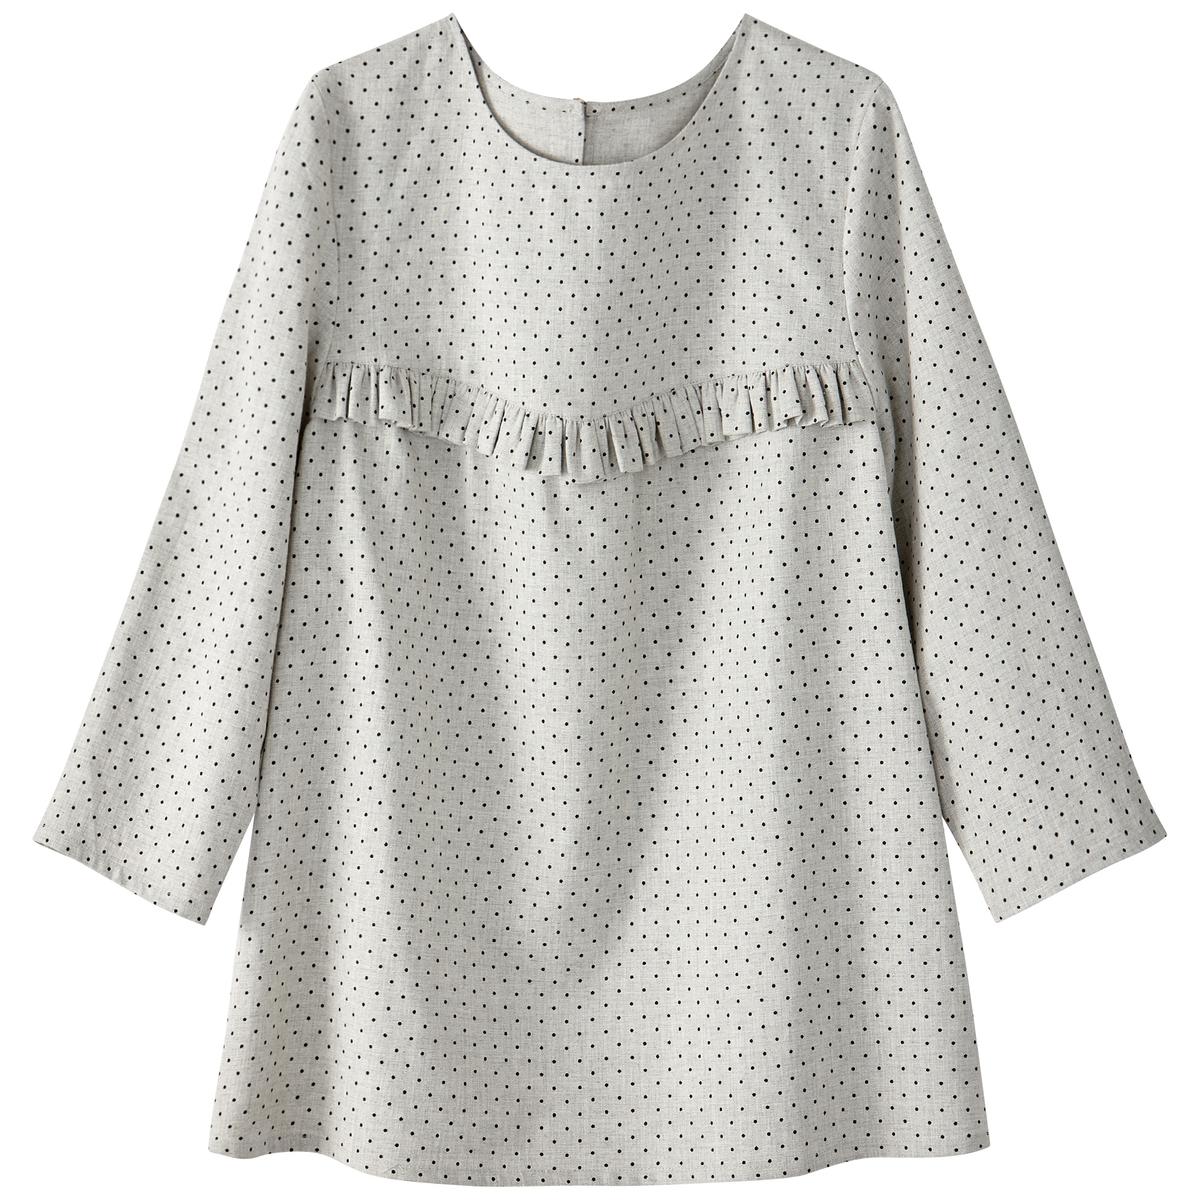 Блузка с рукавами 3/4 и воланом на пластроне